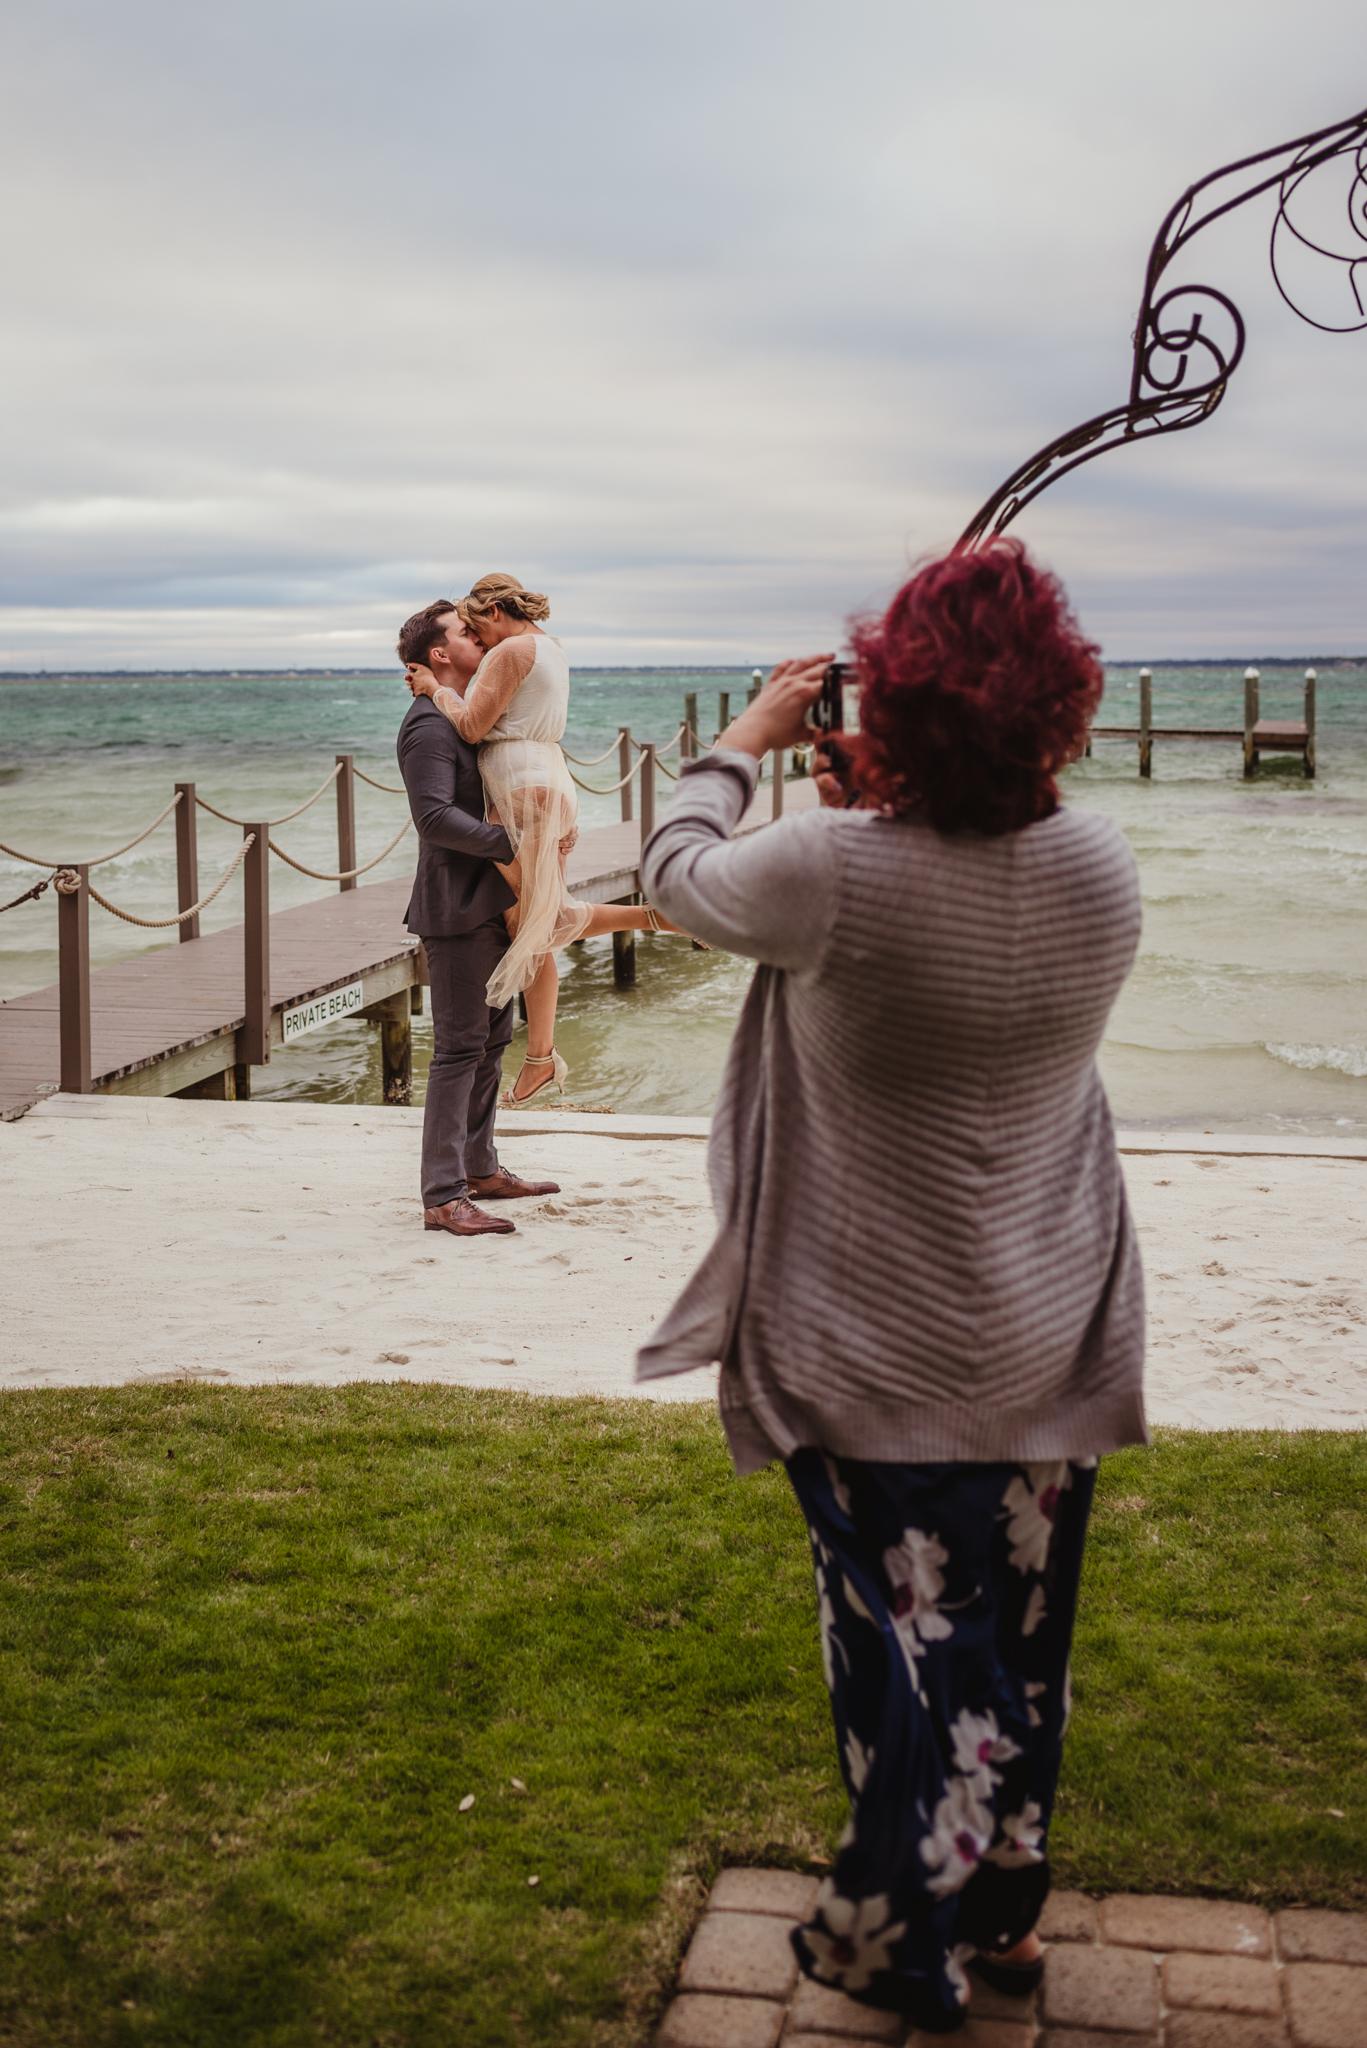 Raleigh-wedding-photography-beach-wedding-portraits1.jpg